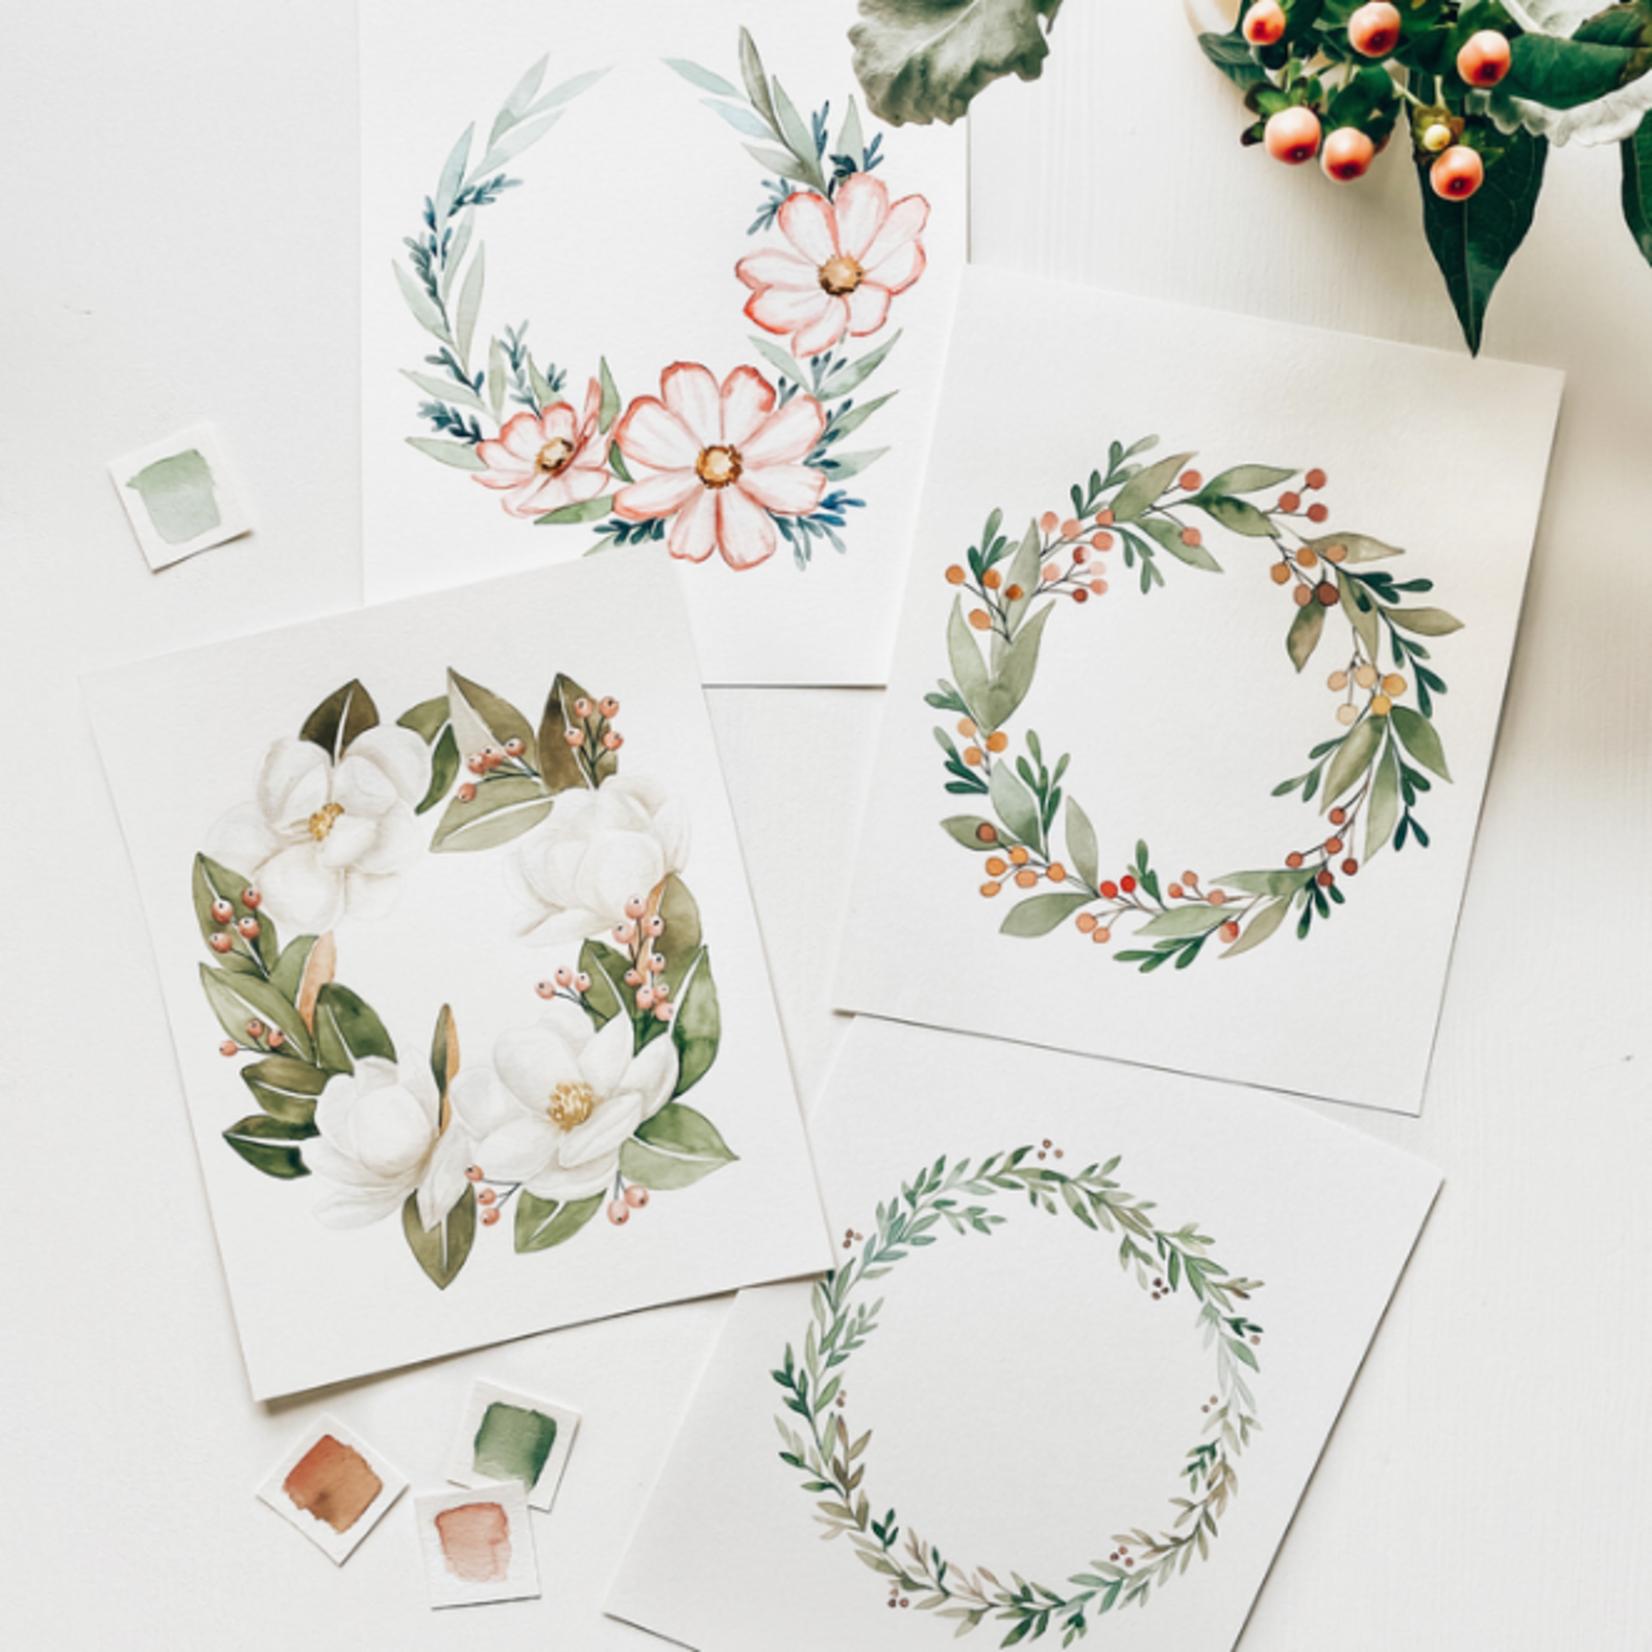 Floral Wreath Watercolour Kit